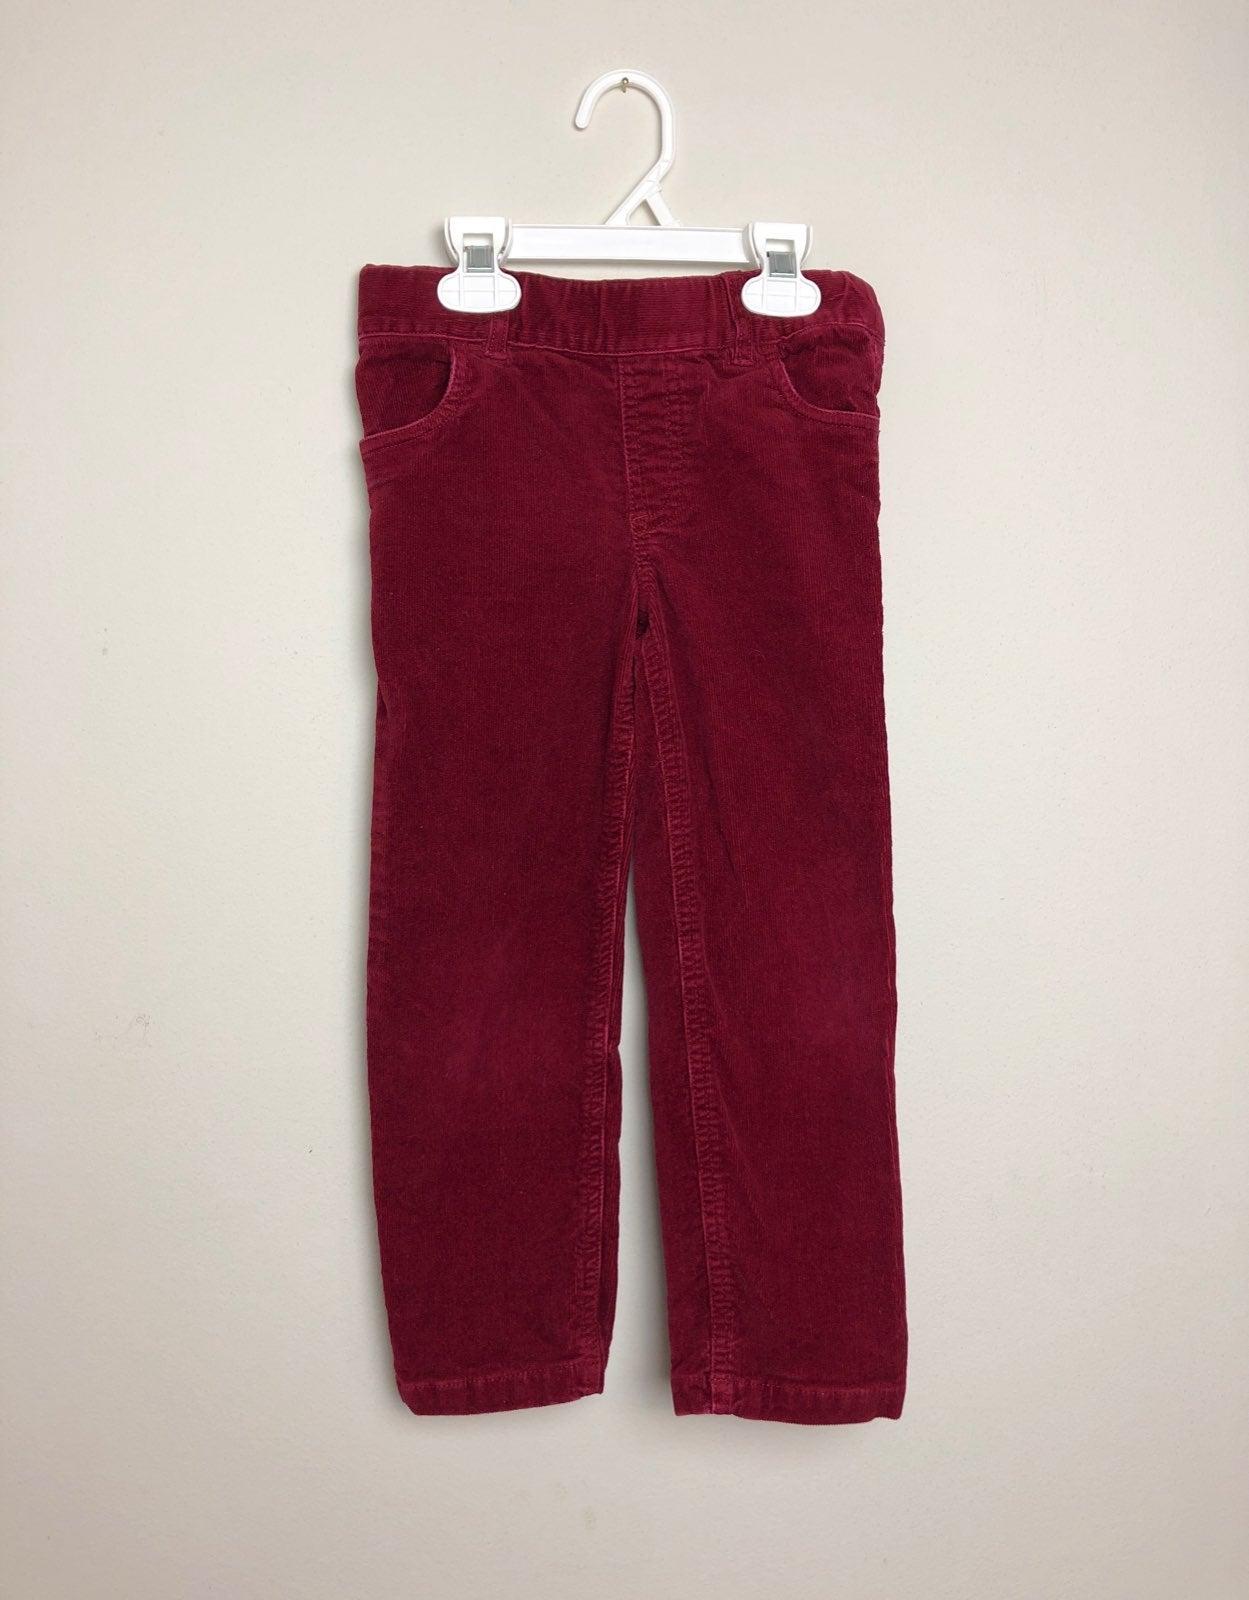 Primary.com Burgundy Corduroy Pants 5